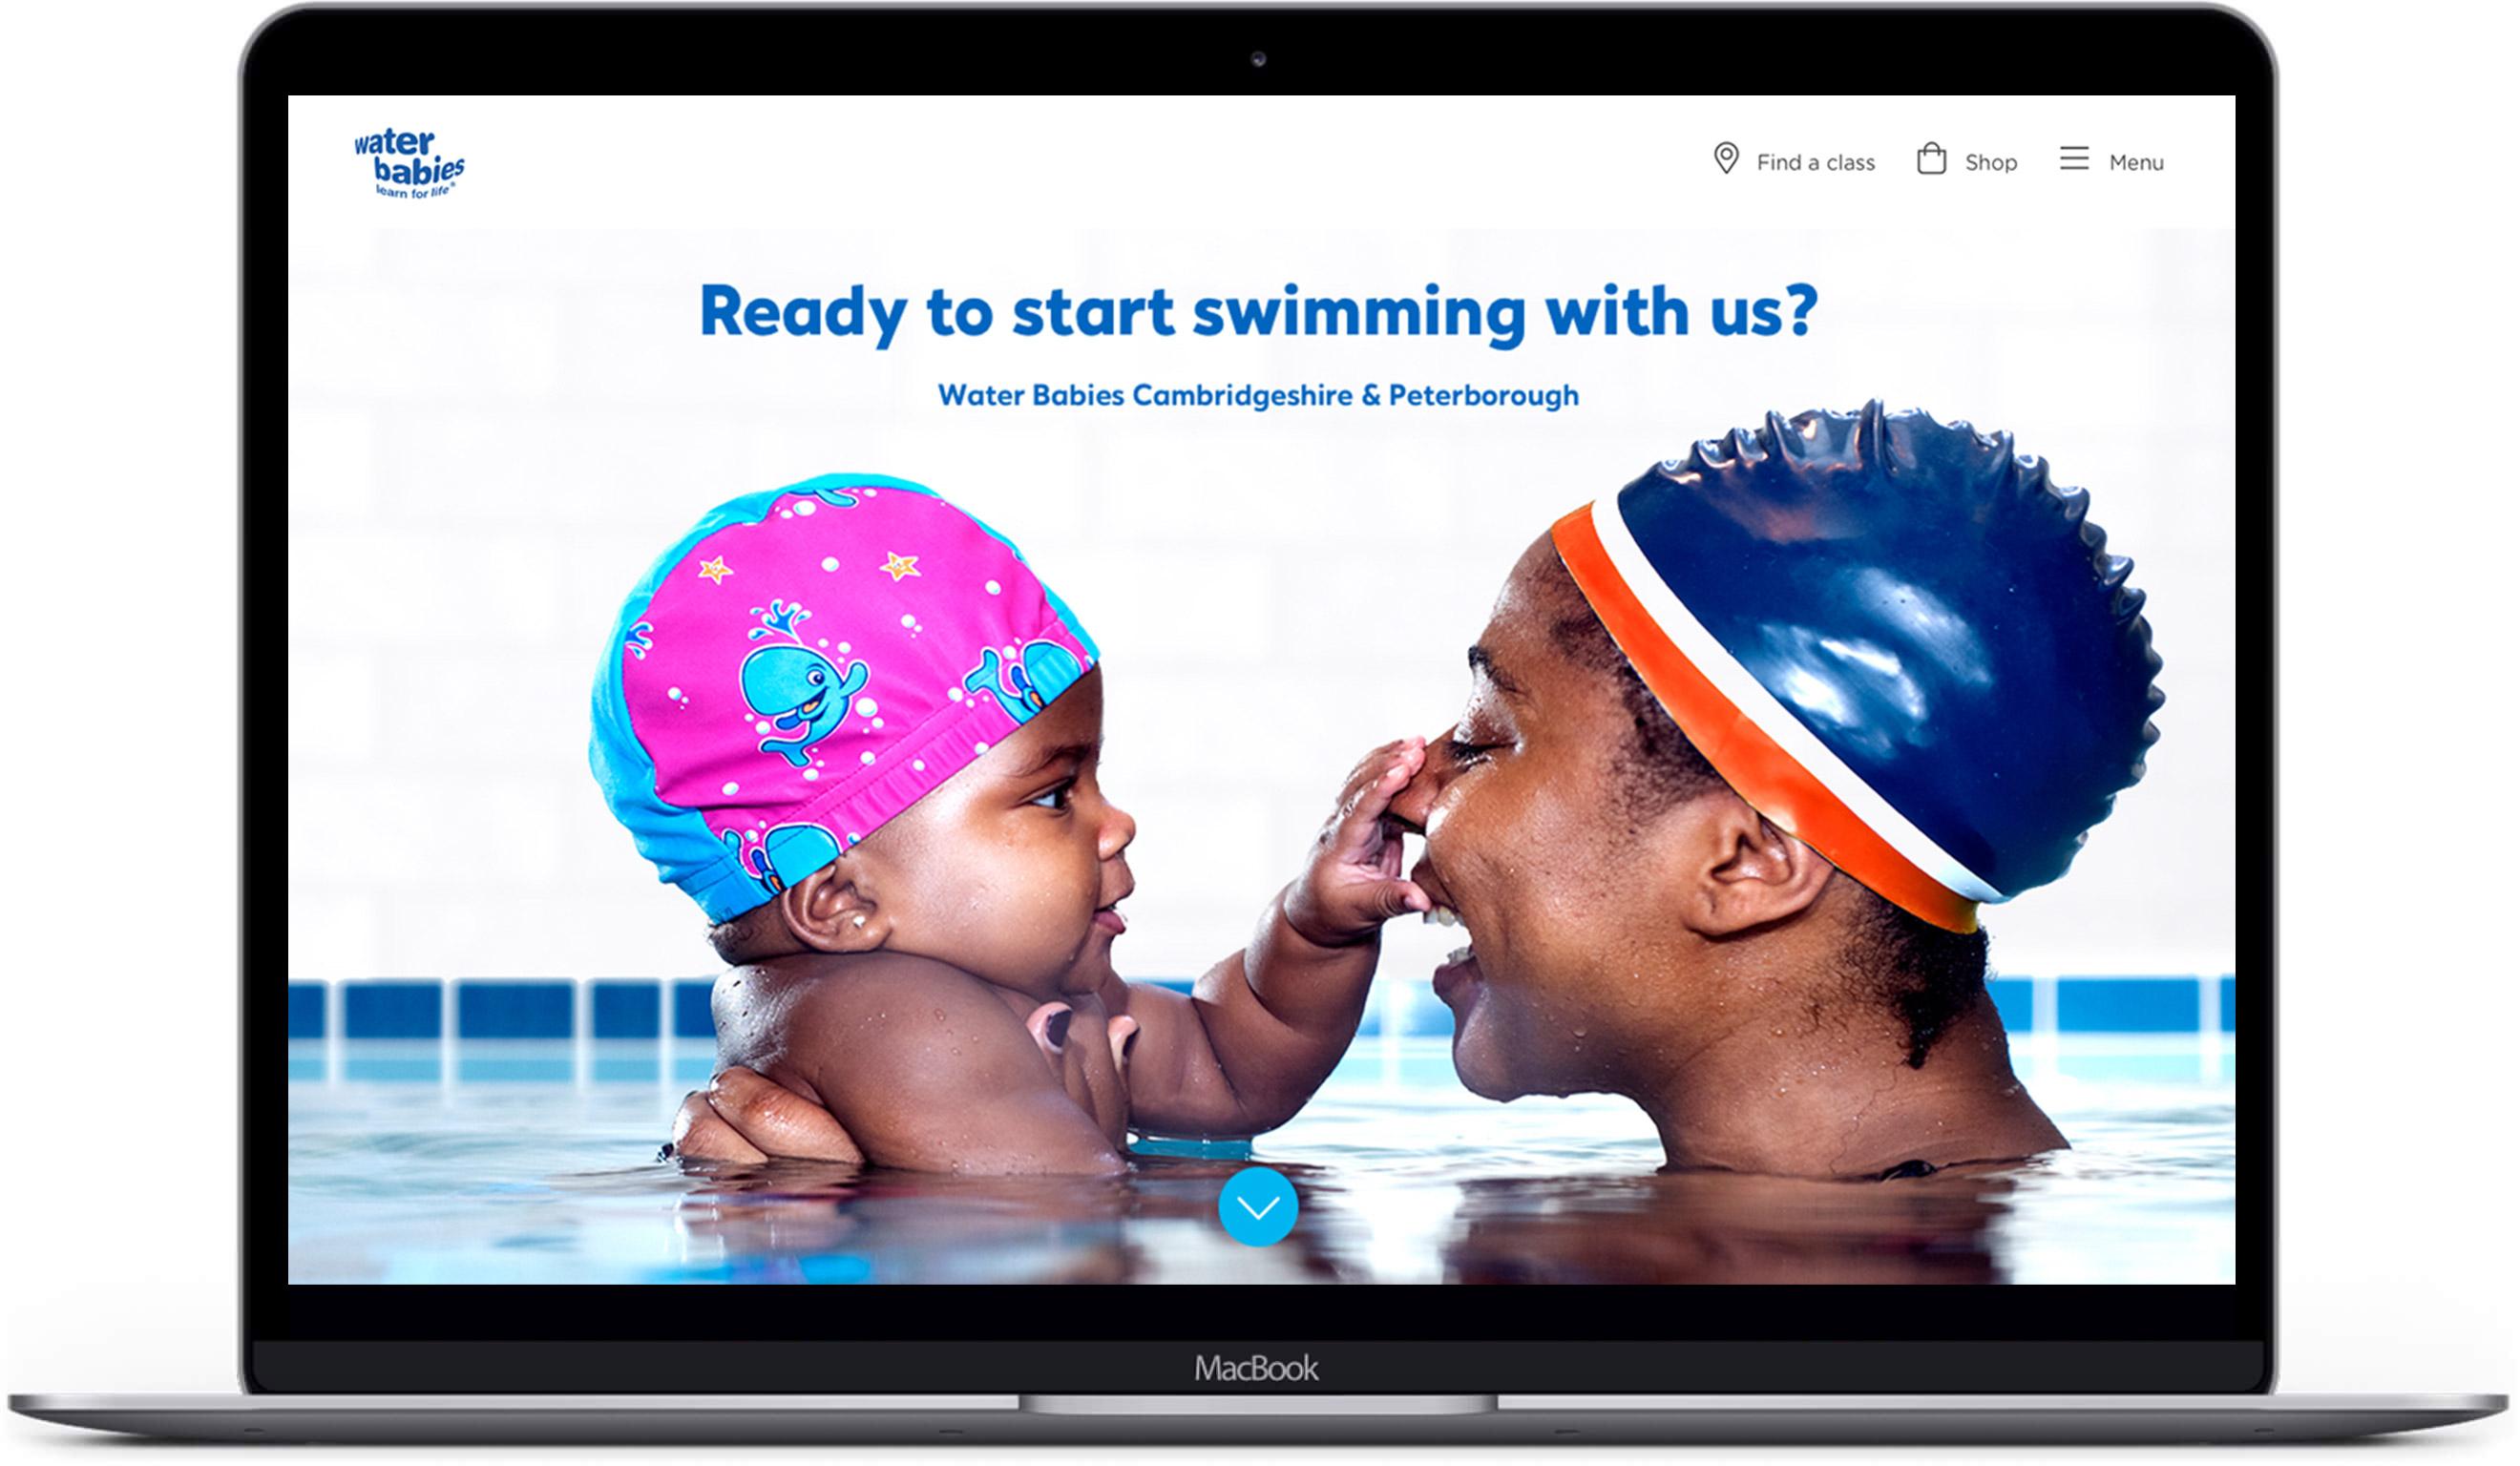 Water Babies website on a laptop